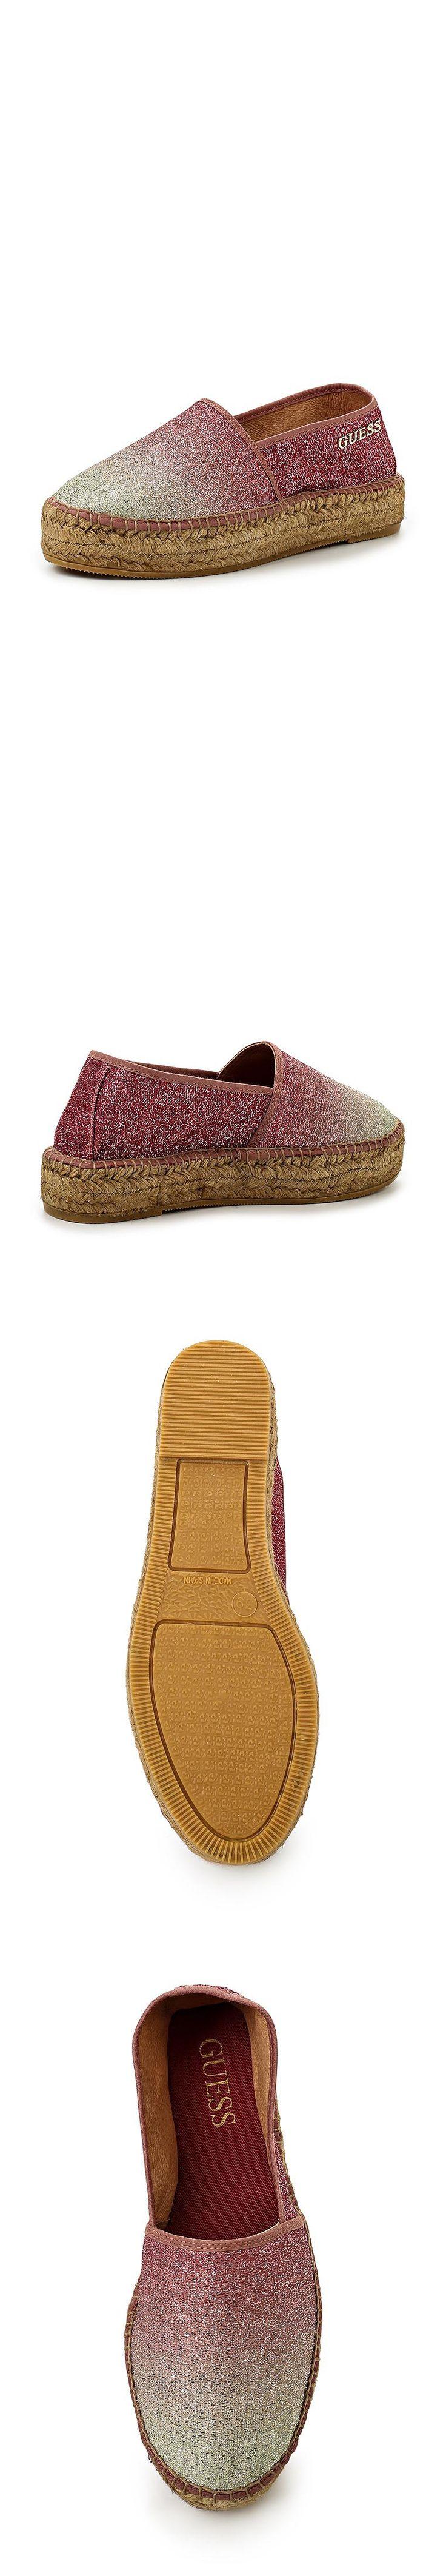 Женская обувь эспадрильи Guess за 10970.00 руб.